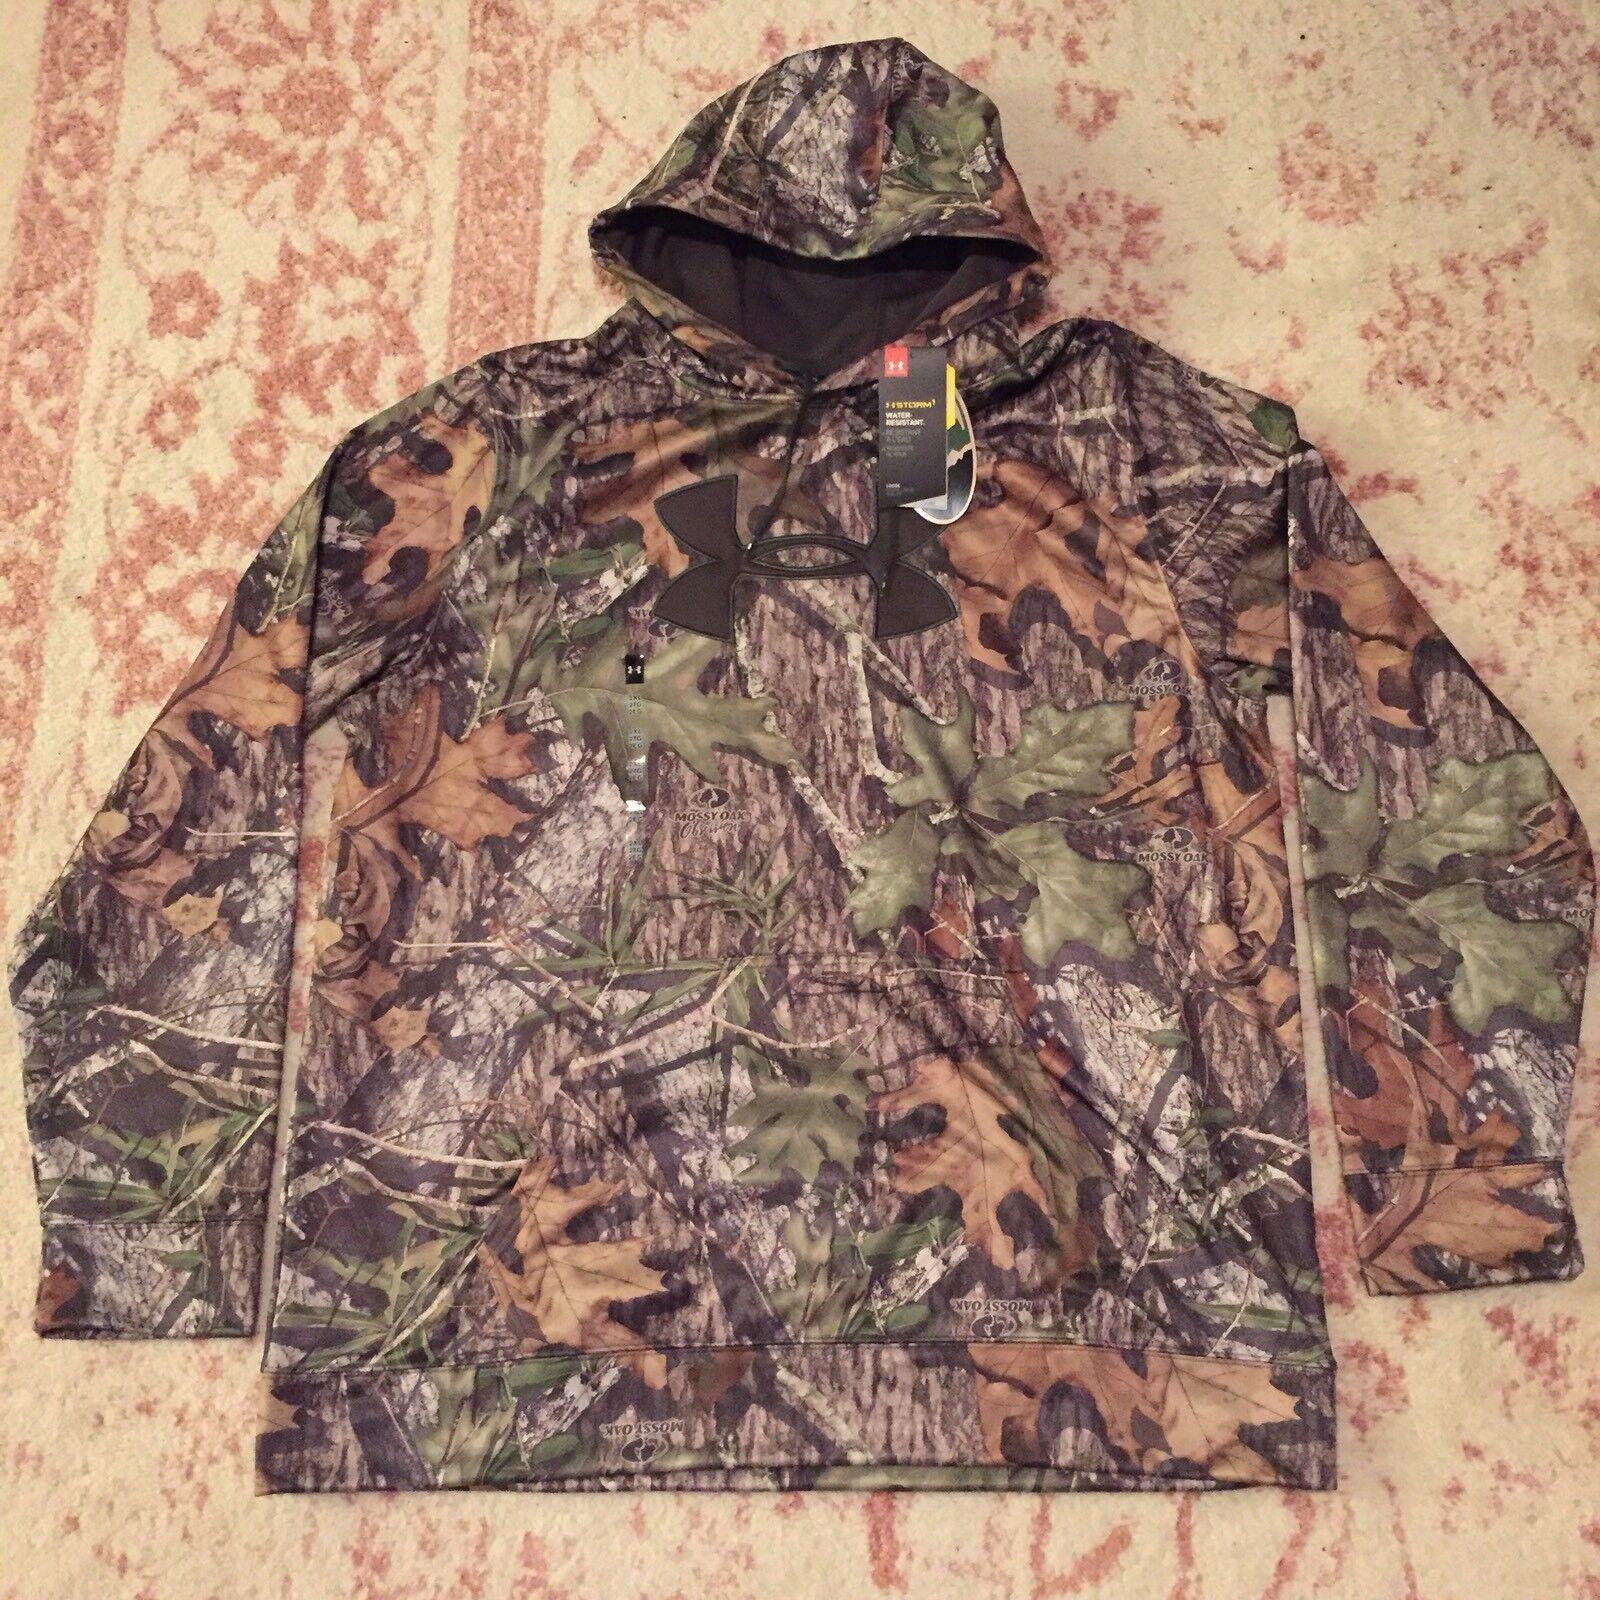 2XL UNDER ARMOUR HOODIE Sweatshirt CAMO MOSSY OAK Storm 1 XXL Real Tree Hunting